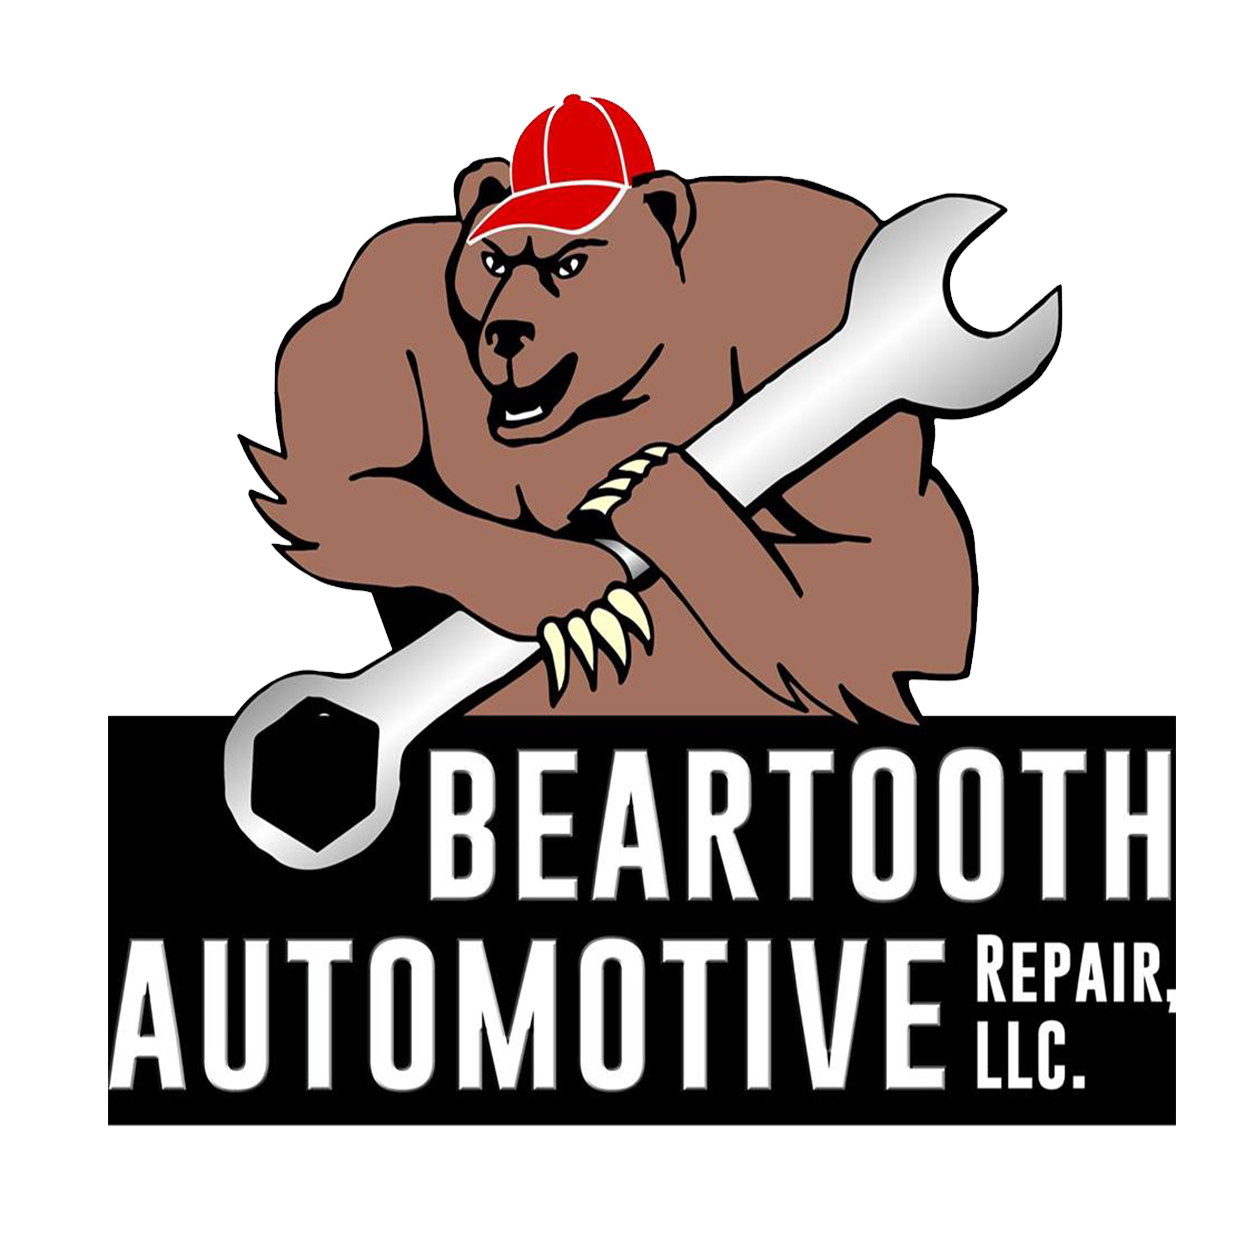 Beartooth Automotive Repair, LLC.